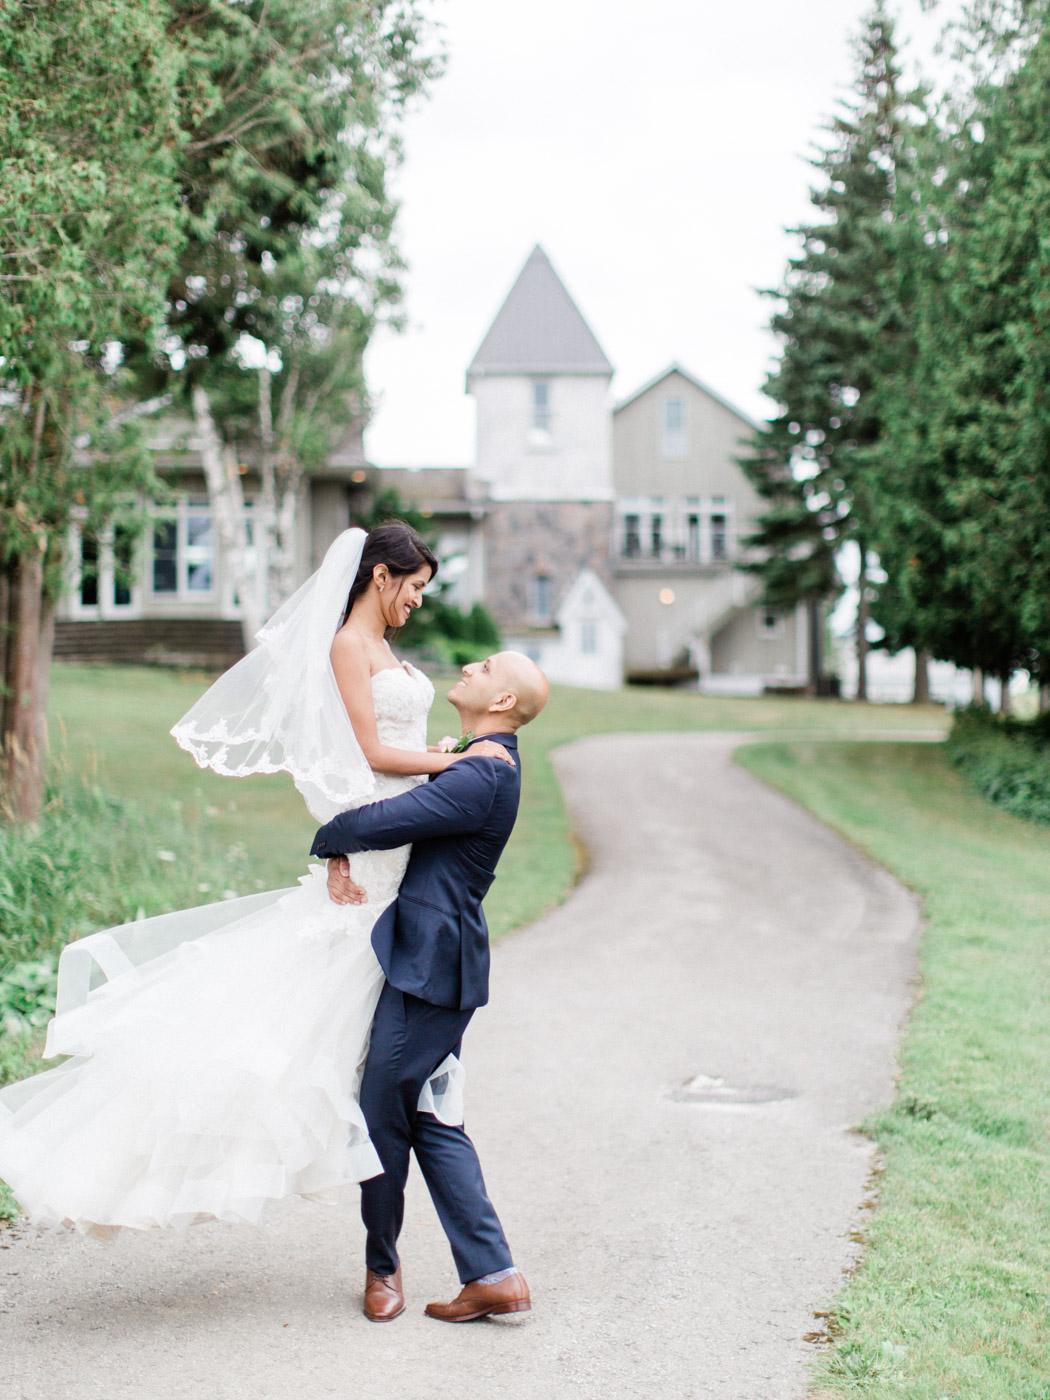 Toronto-Collingwood-wedding-photographer-indian-wedding-documentary69.jpg